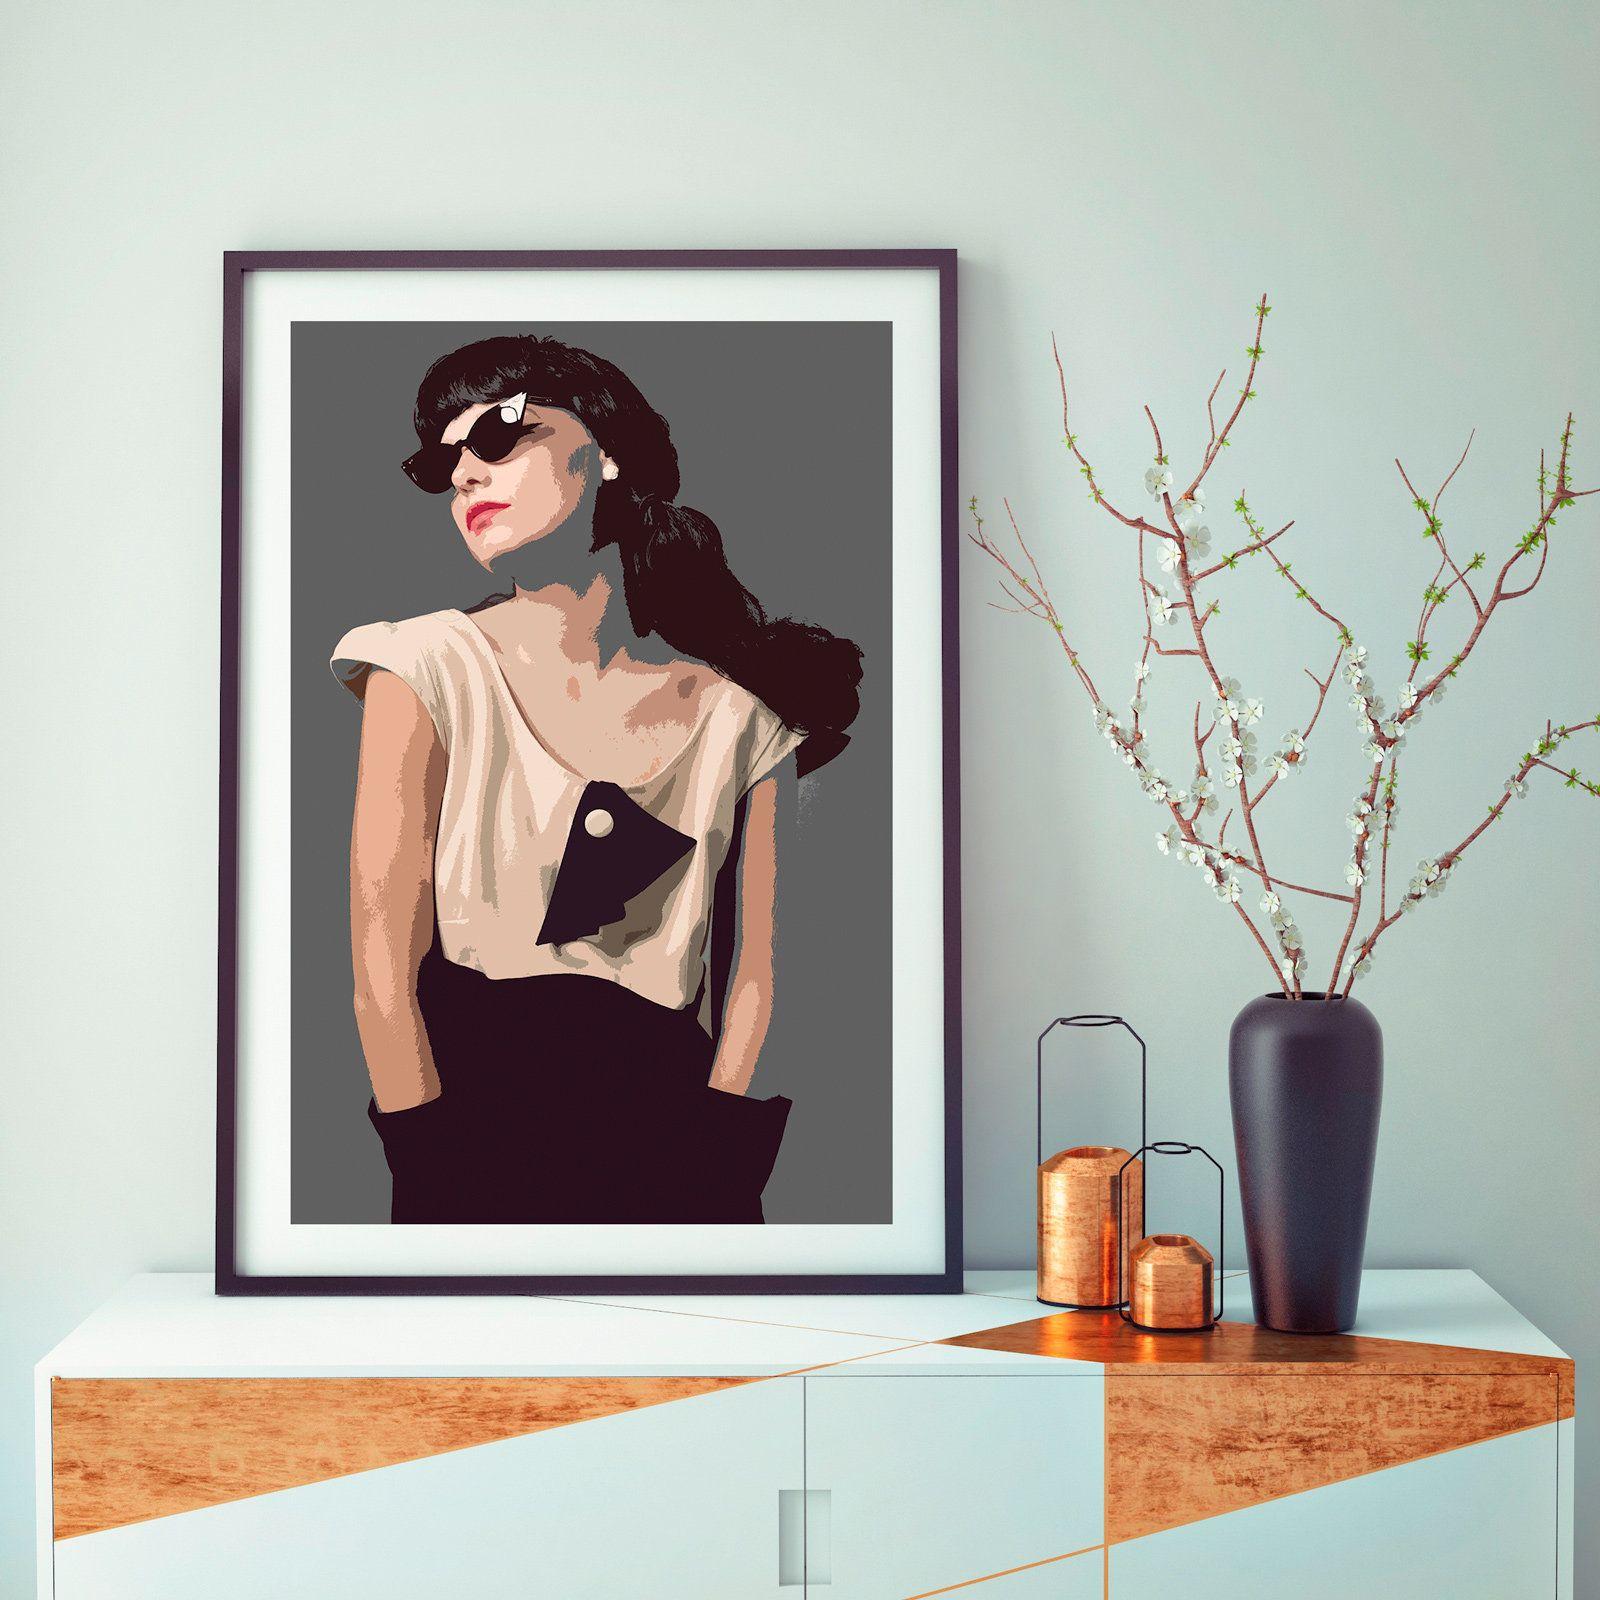 Fashion Photography Pop Art Prints Female Portraits Etsy In 2020 Pop Art Print Pop Art Portrait Photo